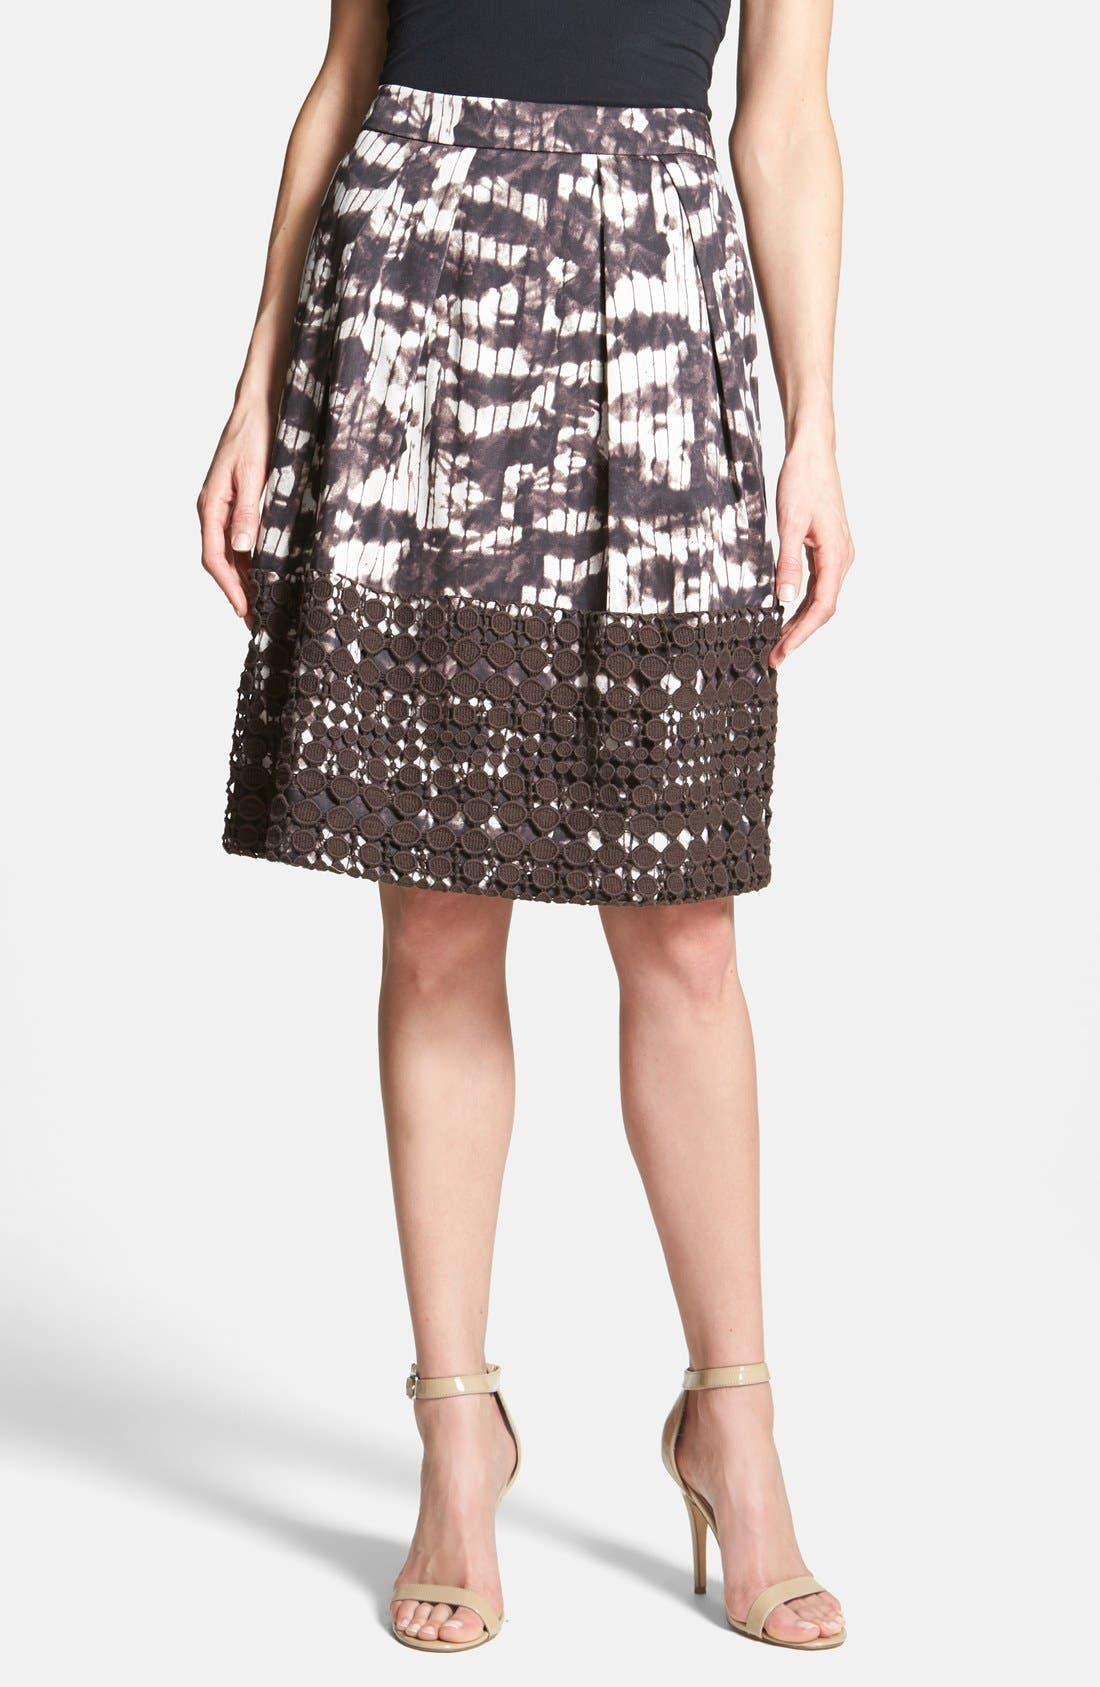 Alternate Image 1 Selected - Weekend Max Mara 'Fresco' Eyelet Trim Print Skirt